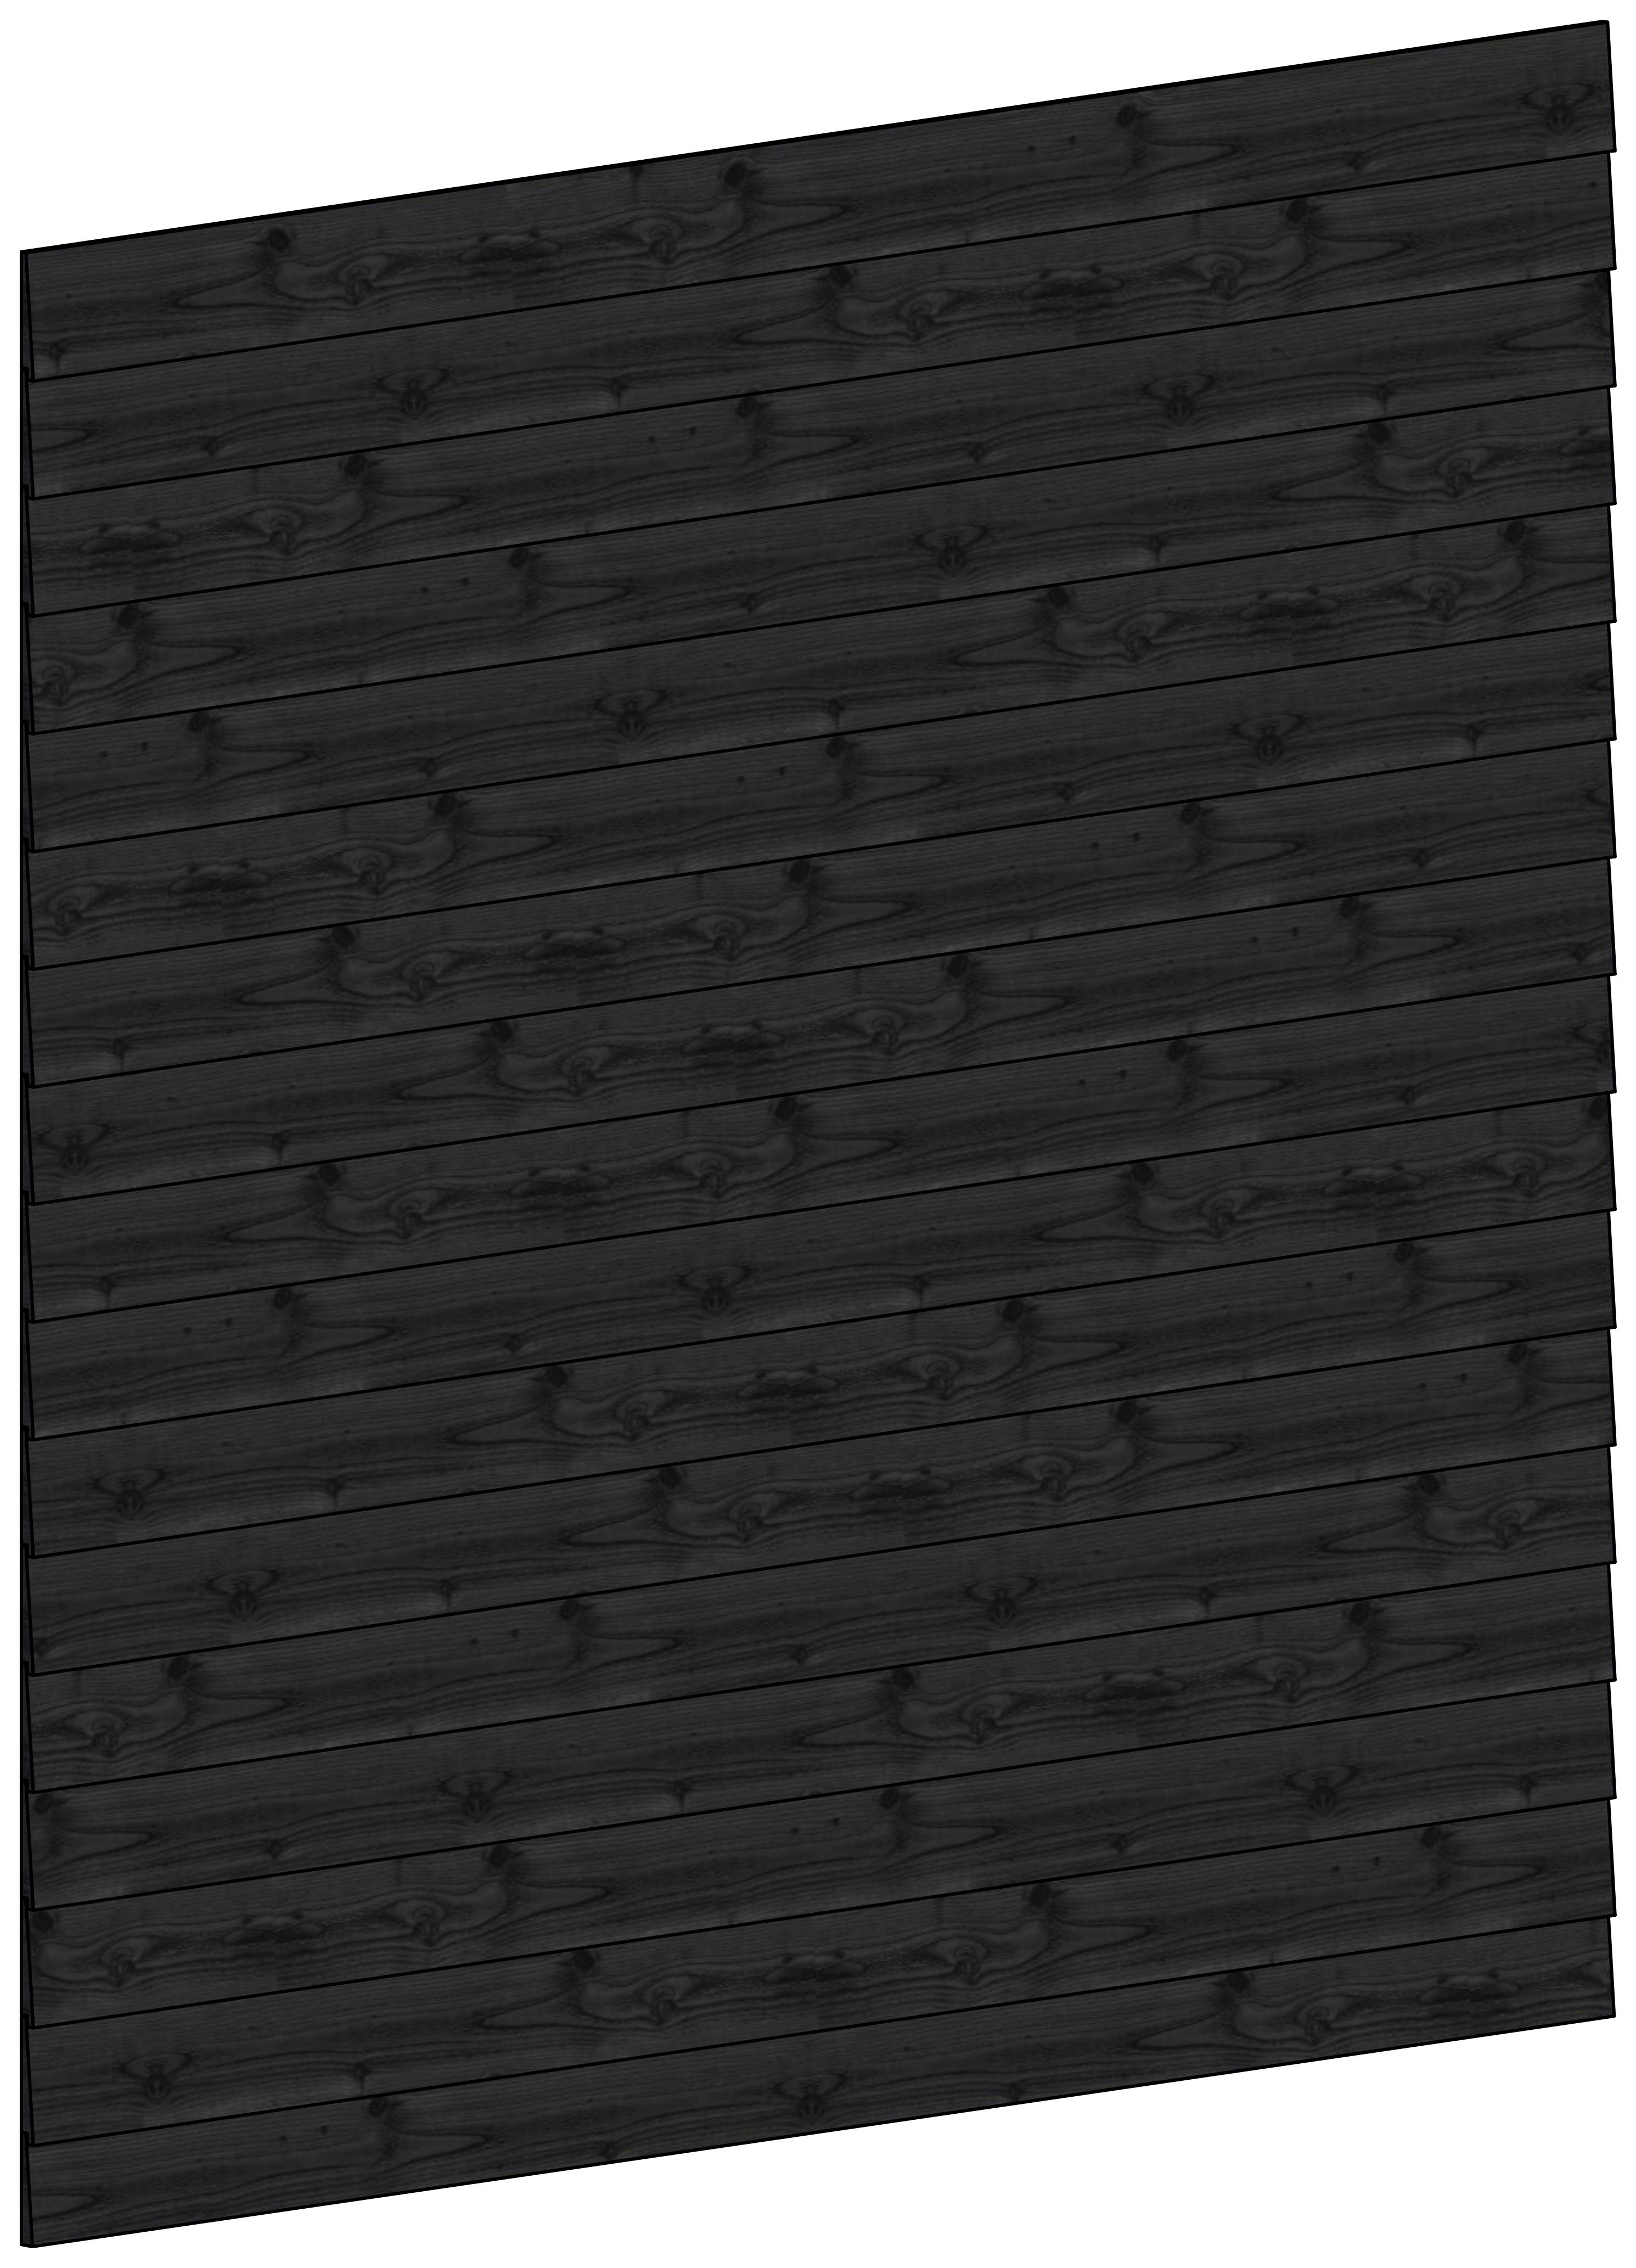 Trendhout | Wandmodule H potdekselplanken zwart | 223x220 cm